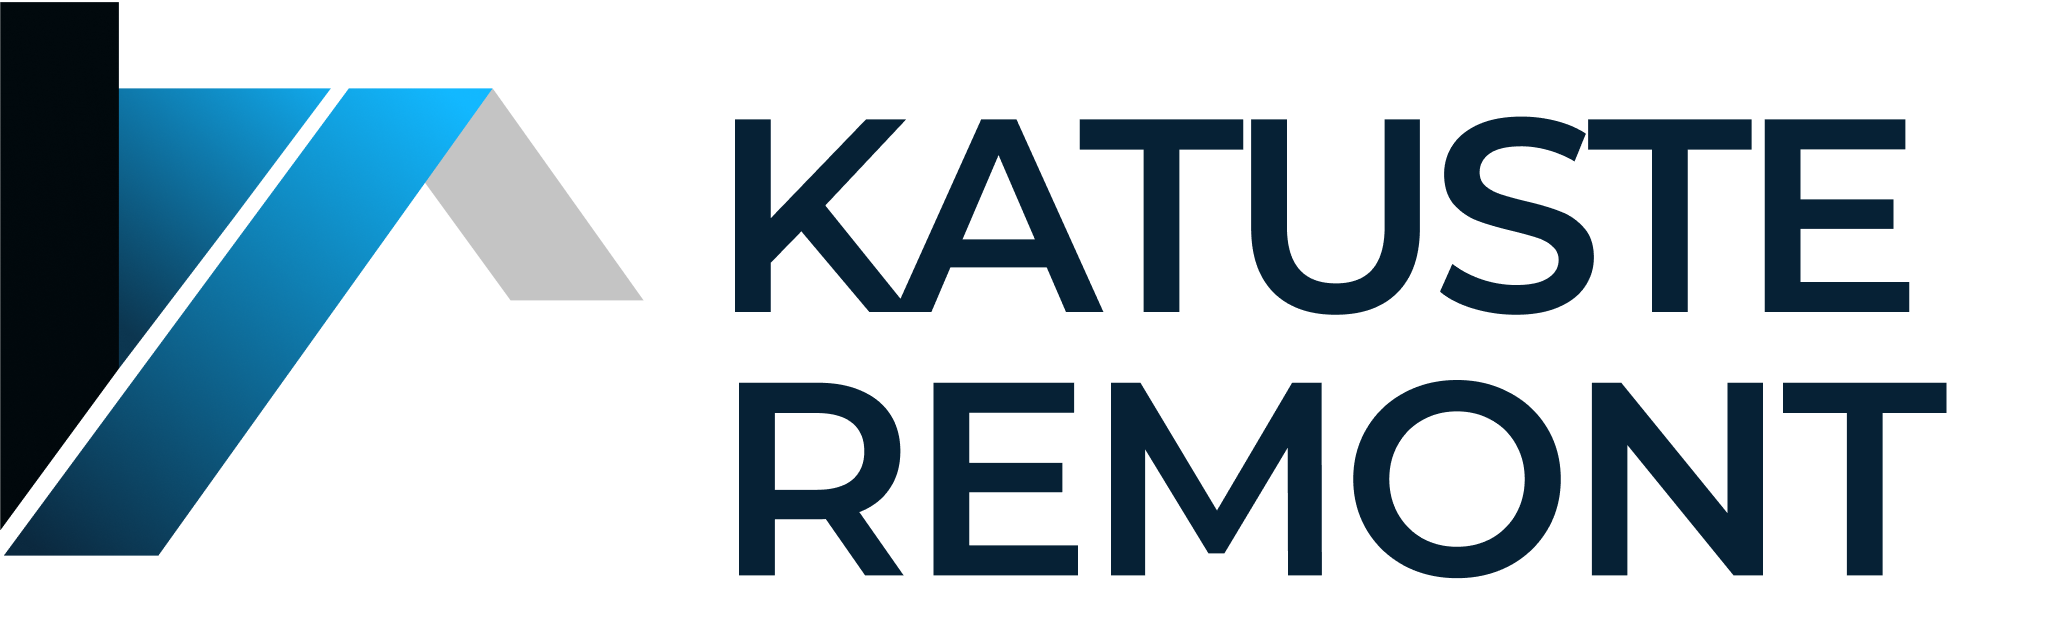 katuste-remont-logo-wide